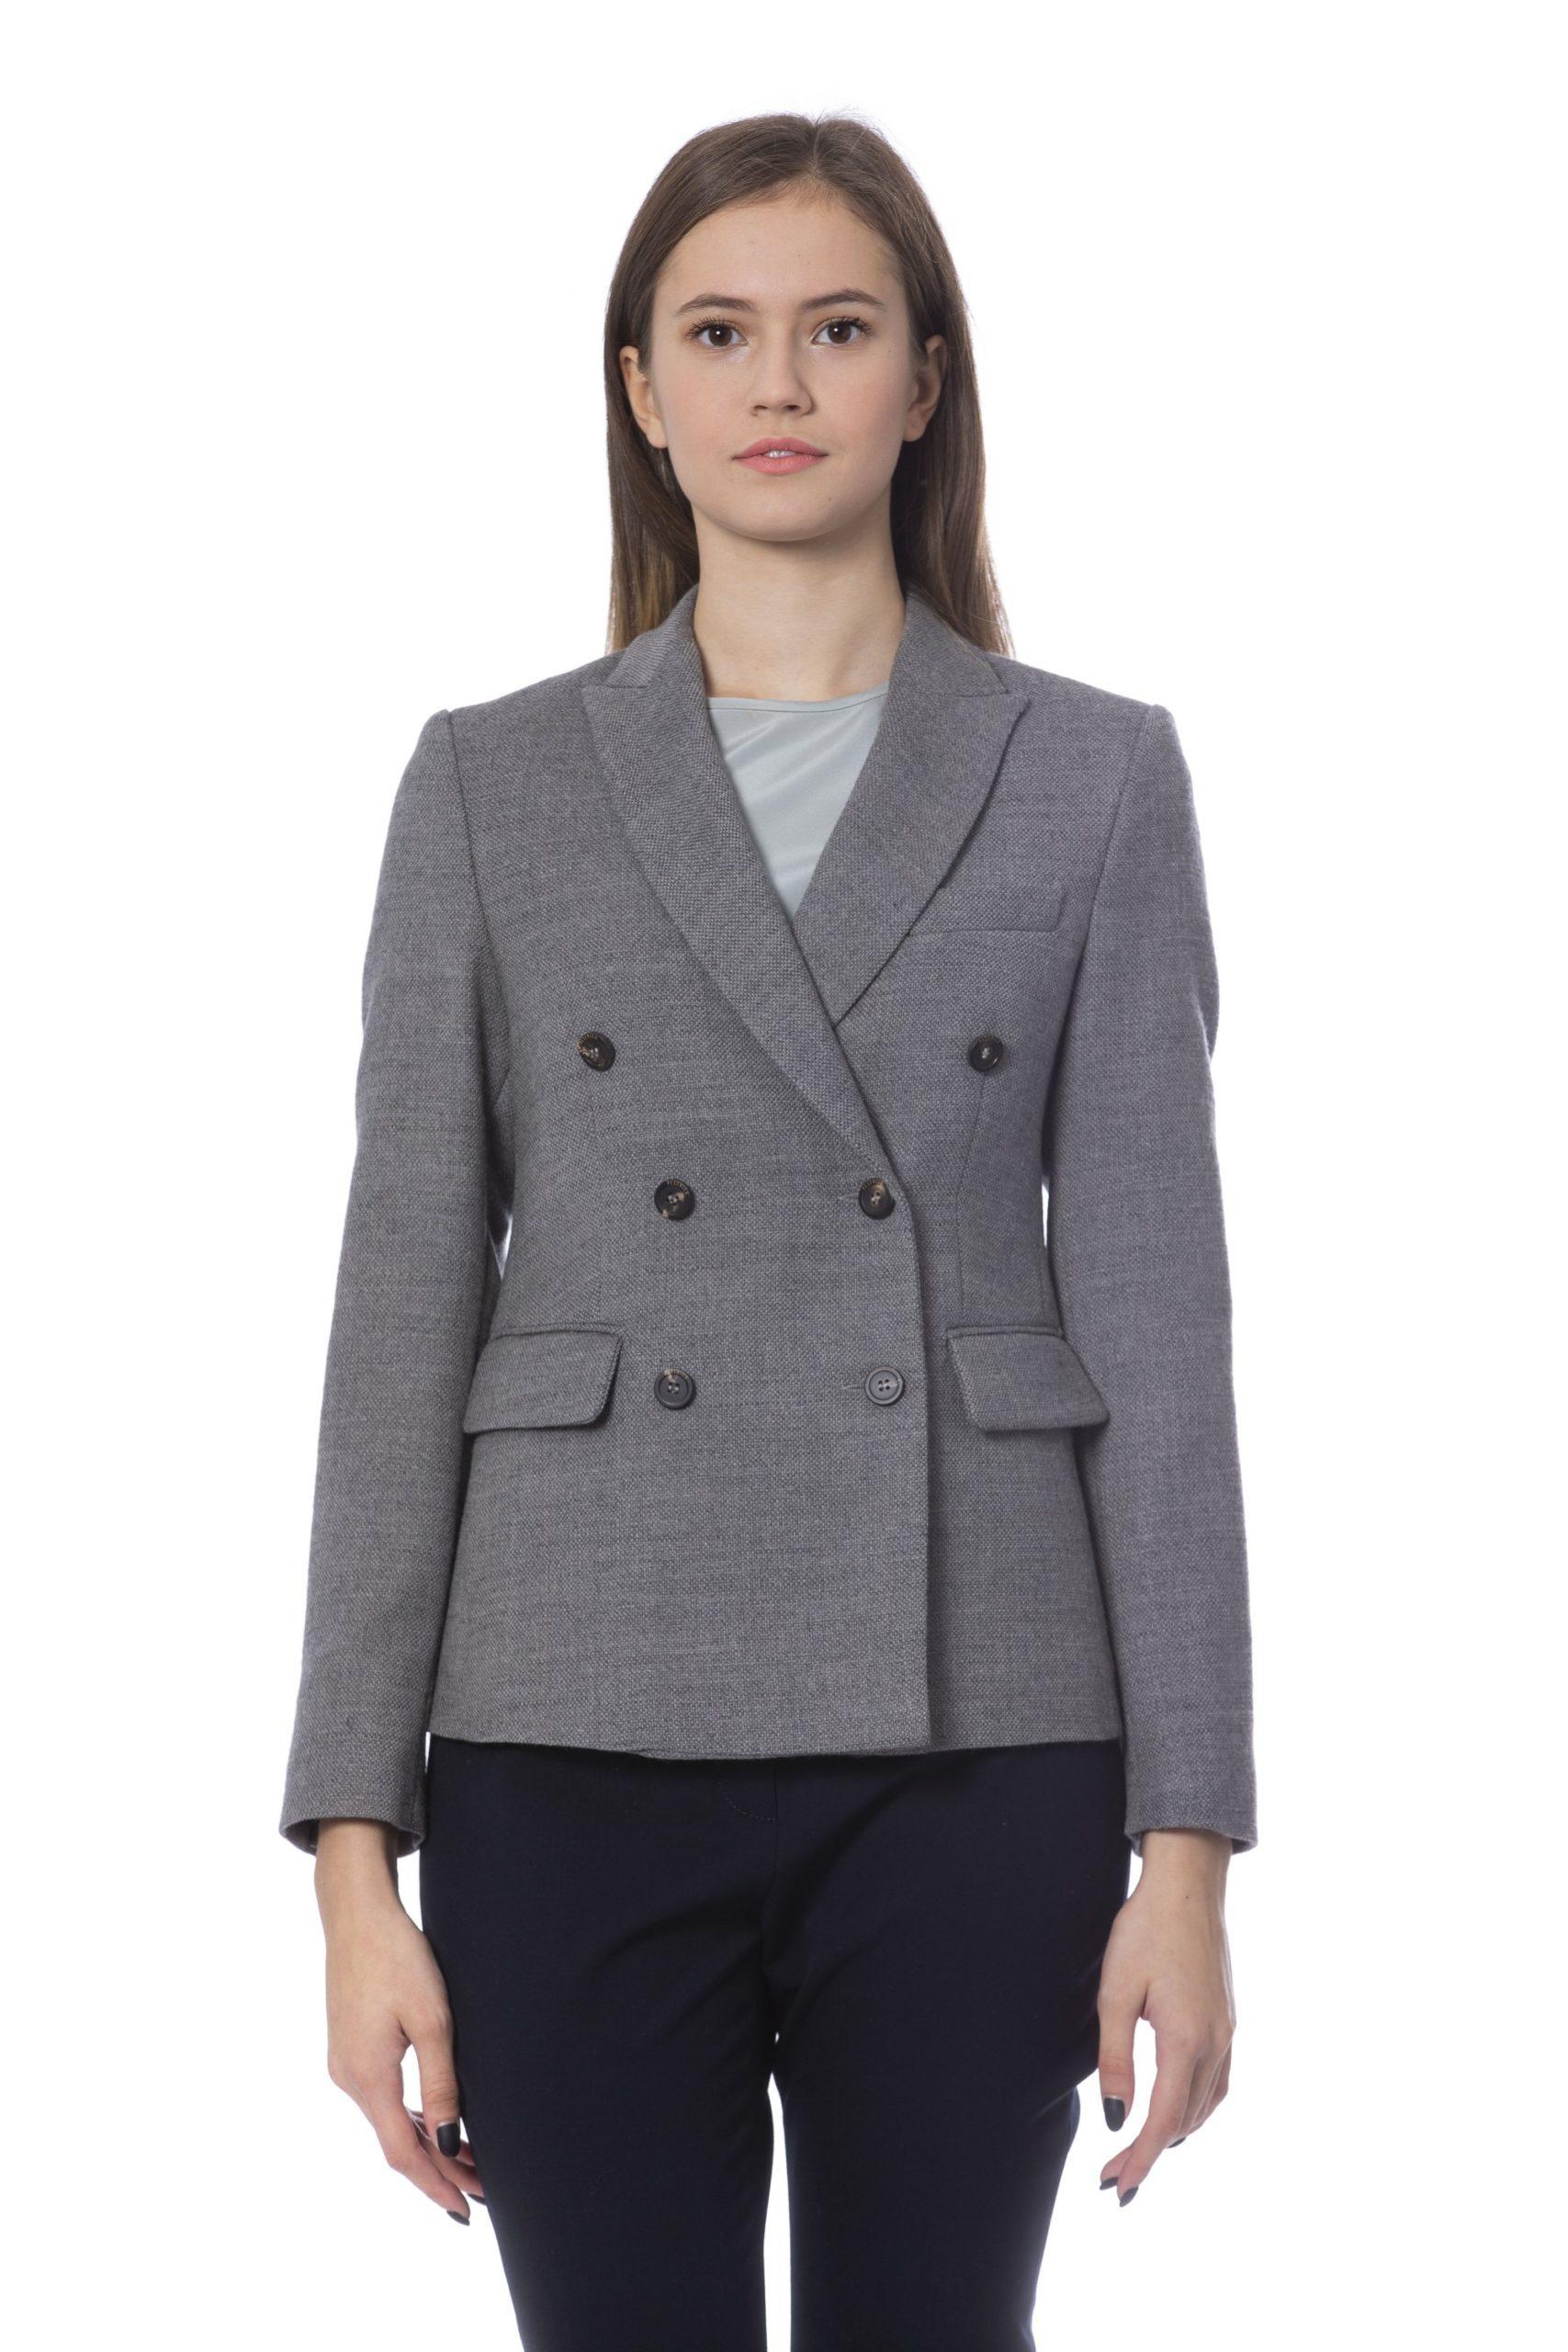 Peserico Women's Jacket Grey PE854594 - IT42 | S